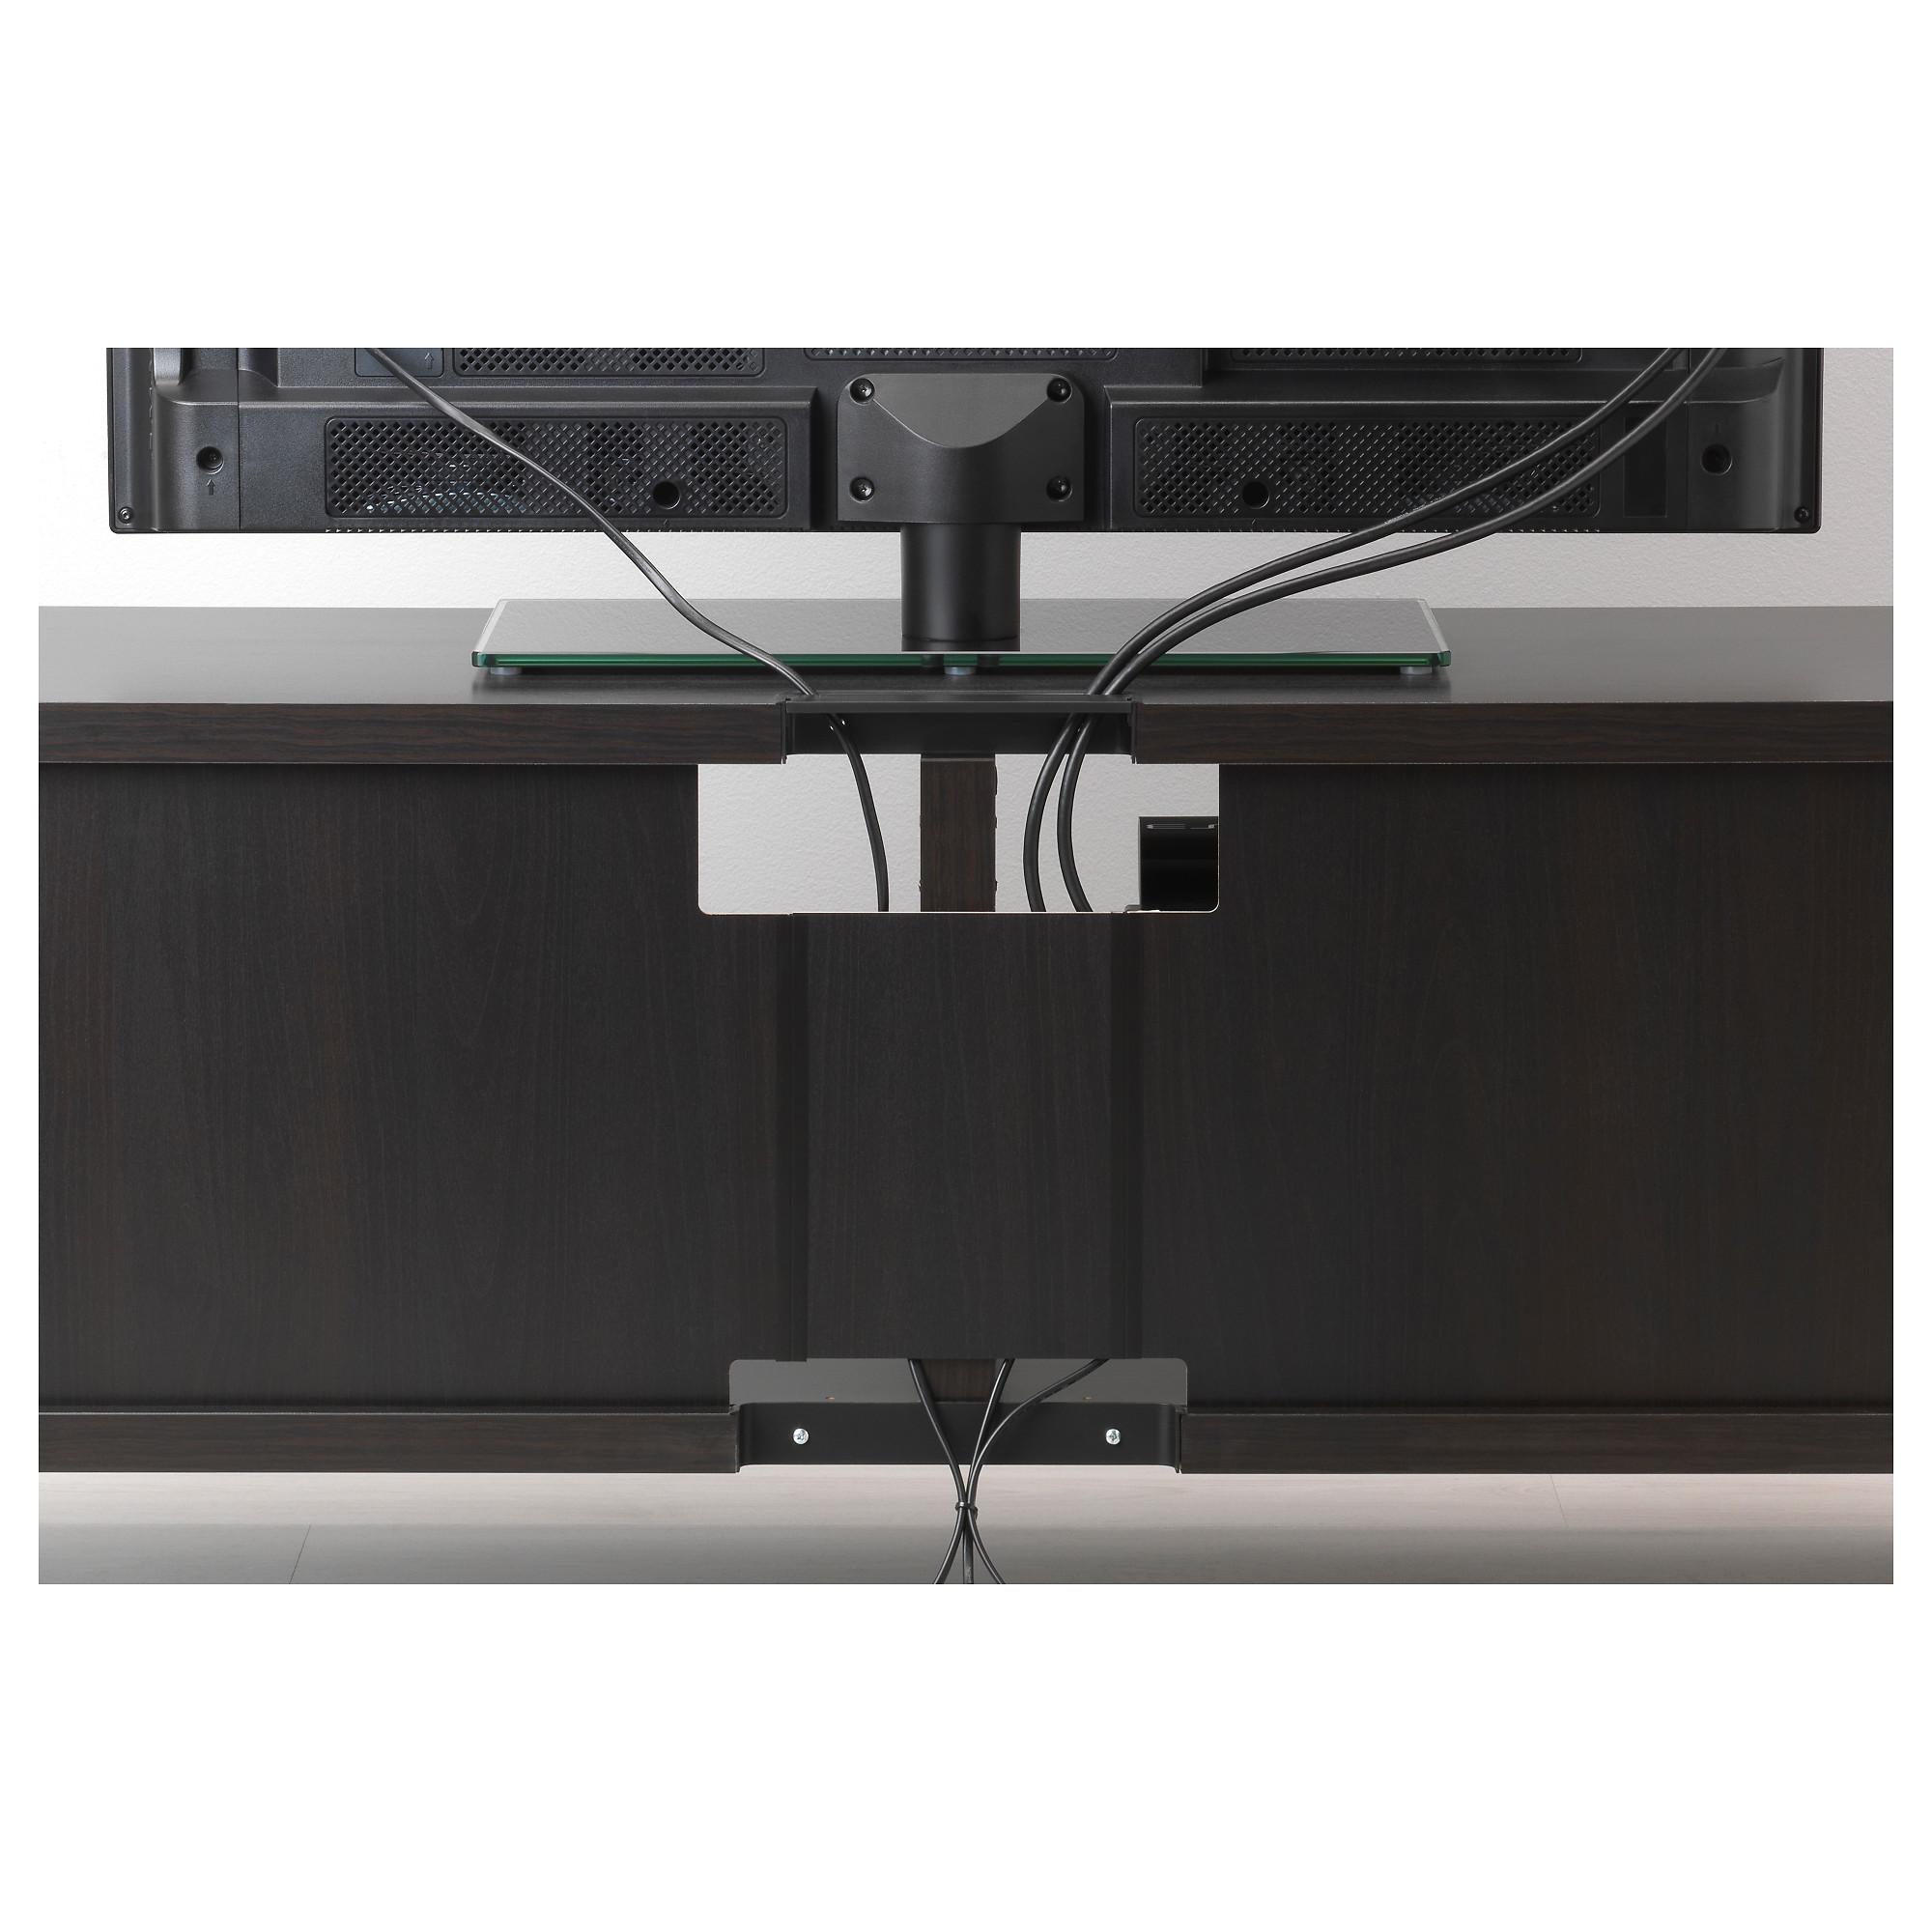 Шкаф для ТВ, комбинация БЕСТО темно-синий артикуль № 292.761.21 в наличии. Интернет сайт IKEA Беларусь. Недорогая доставка и монтаж.